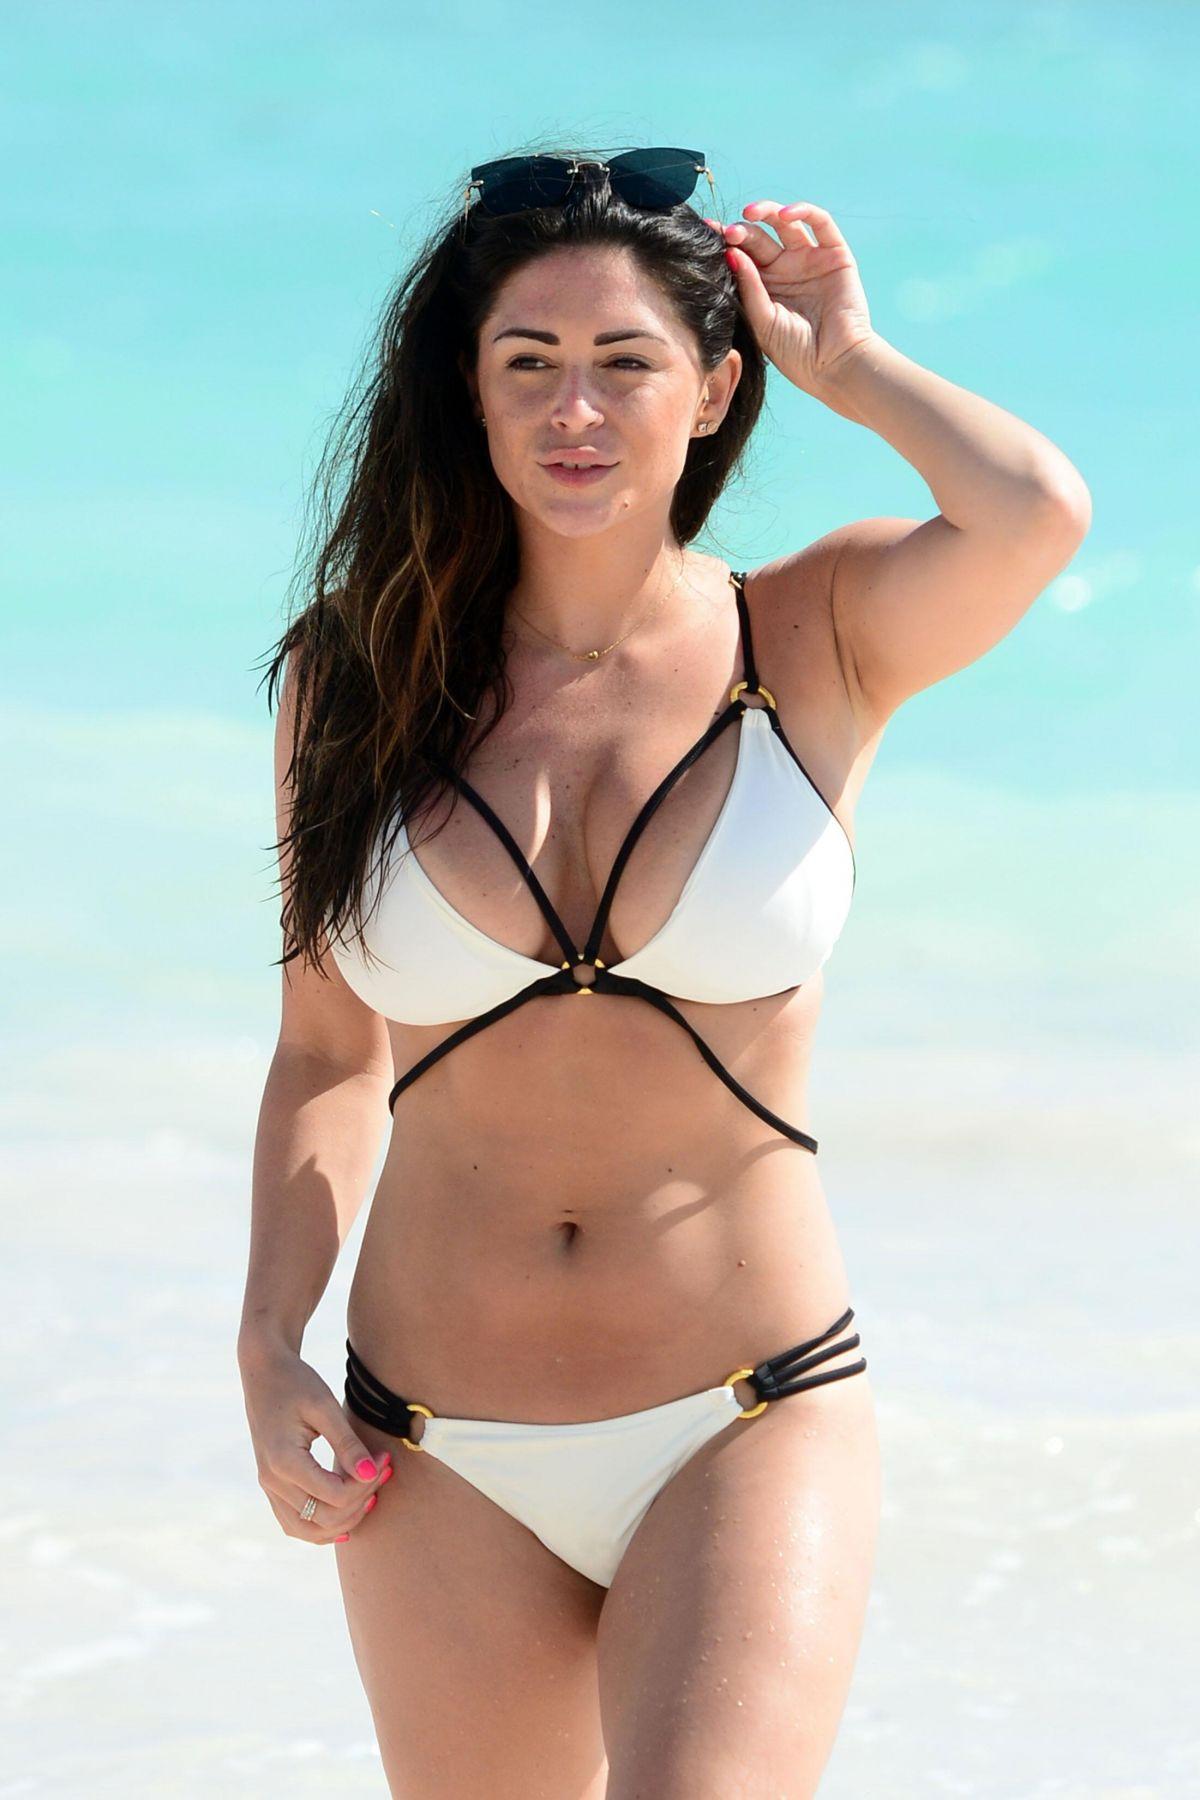 It's like Dominican republic bikini Russian woman